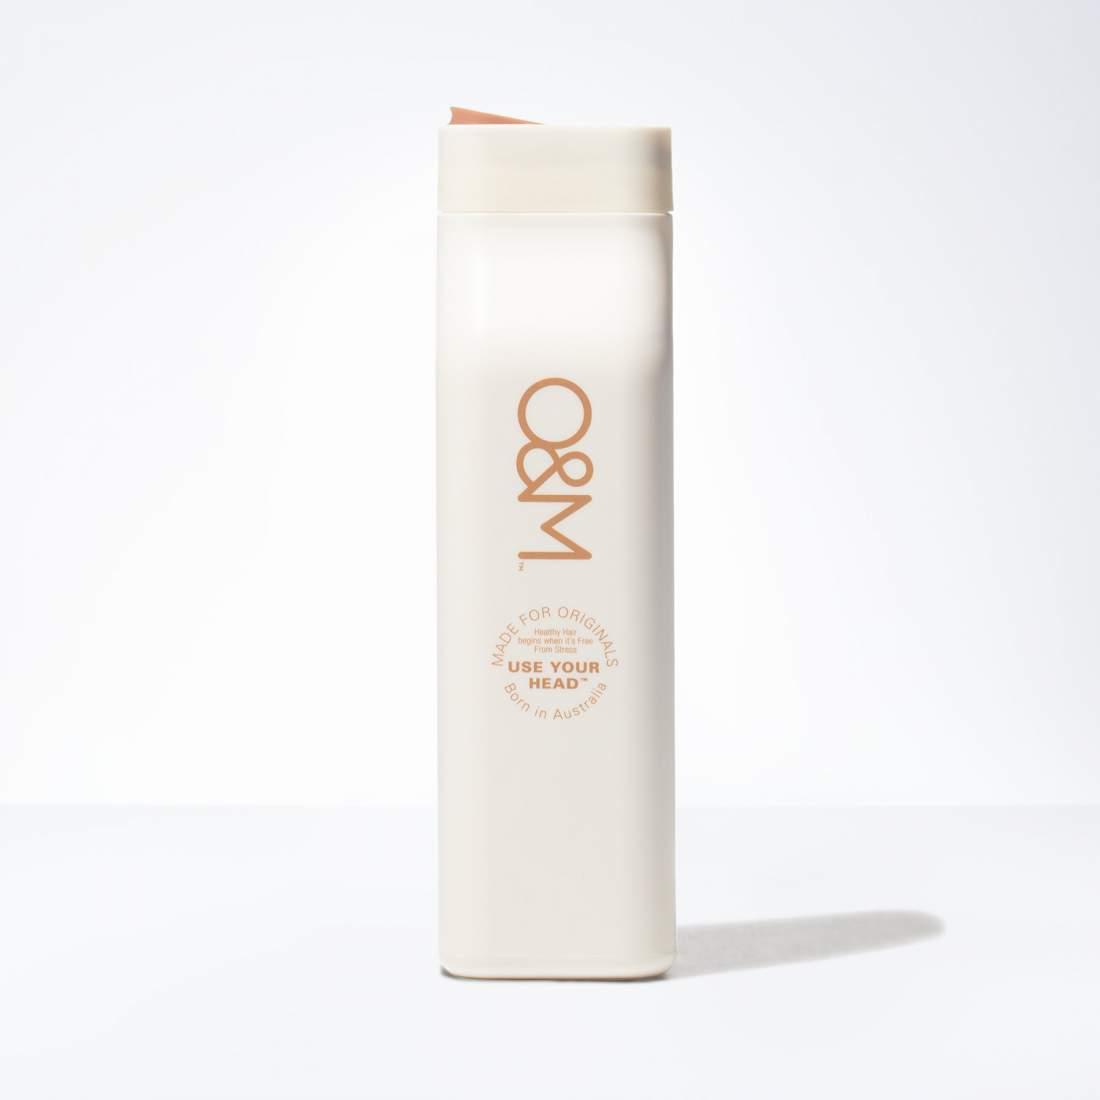 Tömegnövelő kondicionáló - O&M Fine Intellect Conditioner for Volume